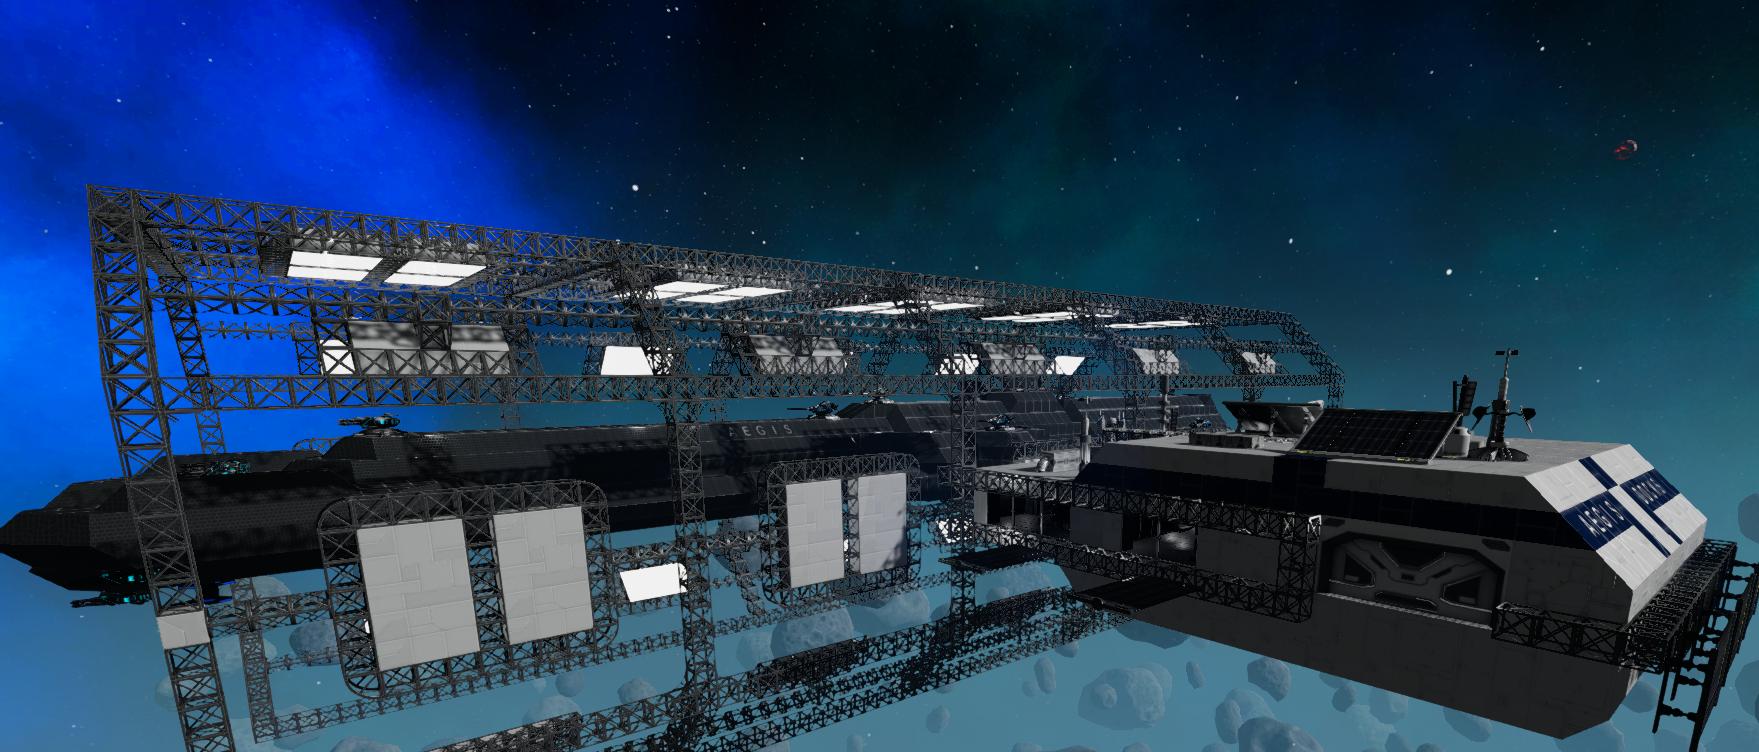 Empyrion: Galactic Survival Workshop Aegis Docks